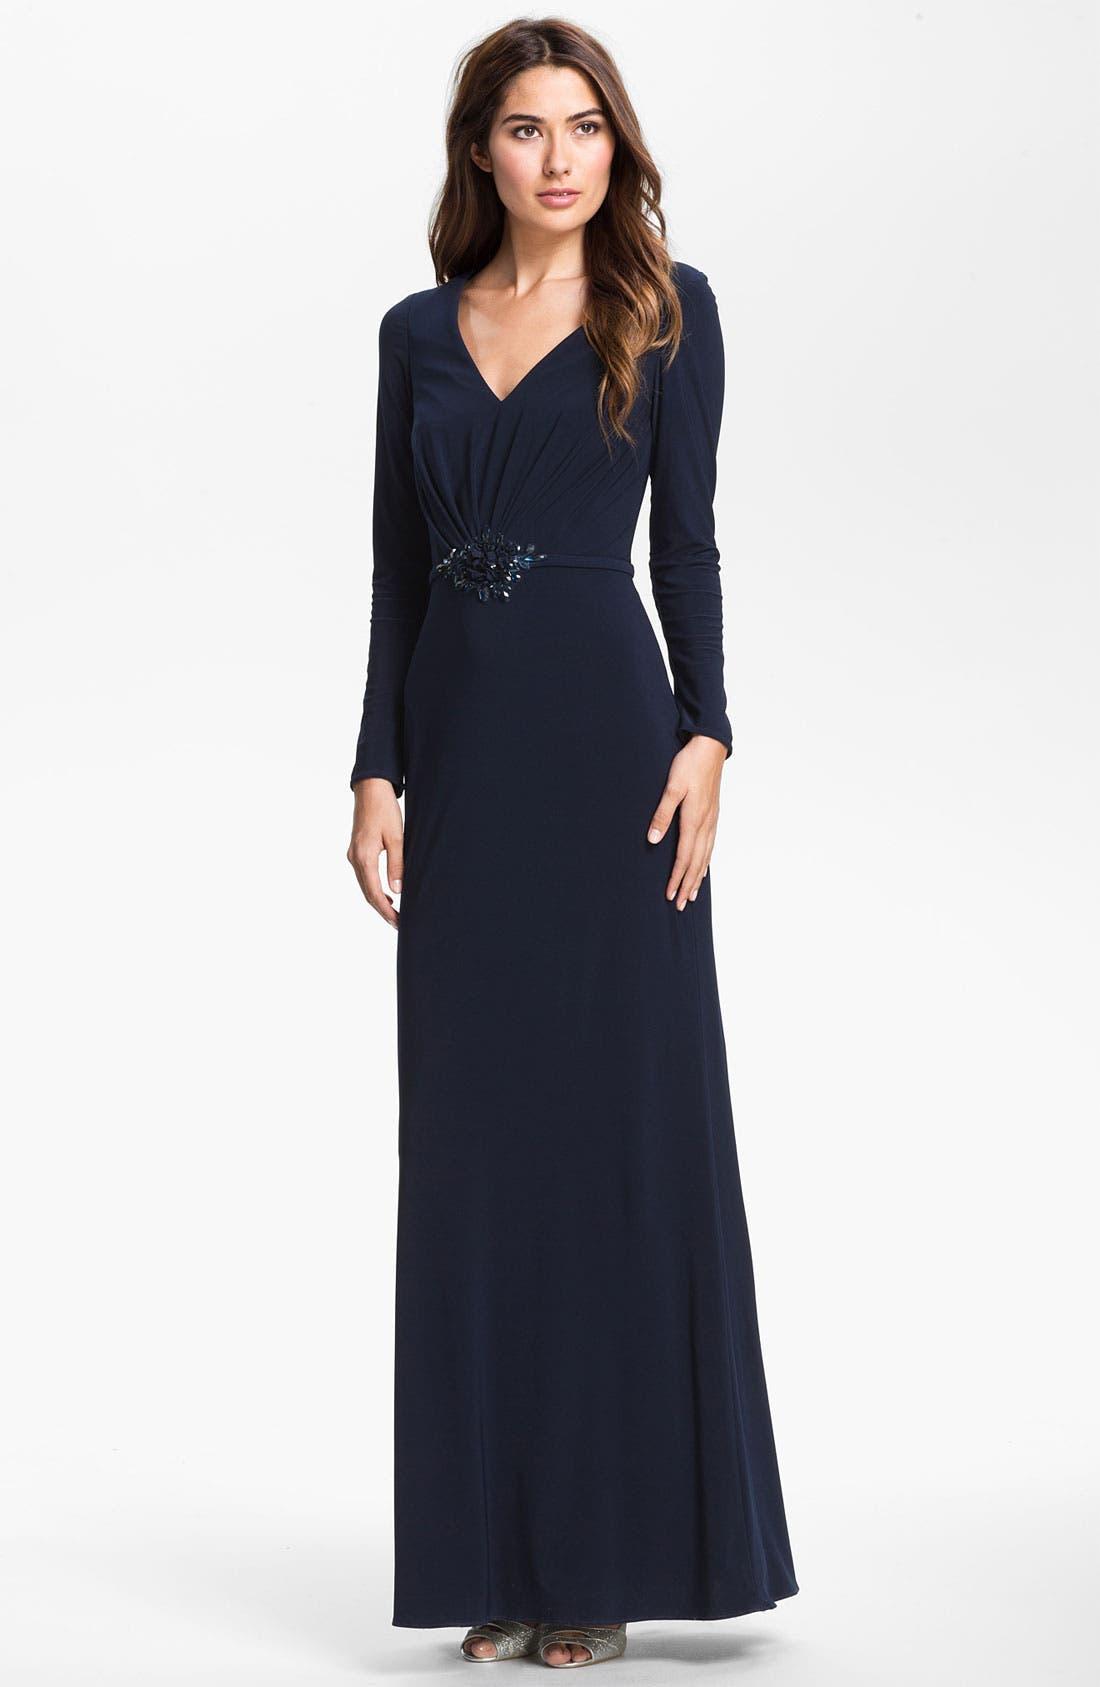 Alternate Image 1 Selected - Kathy Hilton Embellished Long Sleeve Jersey Gown